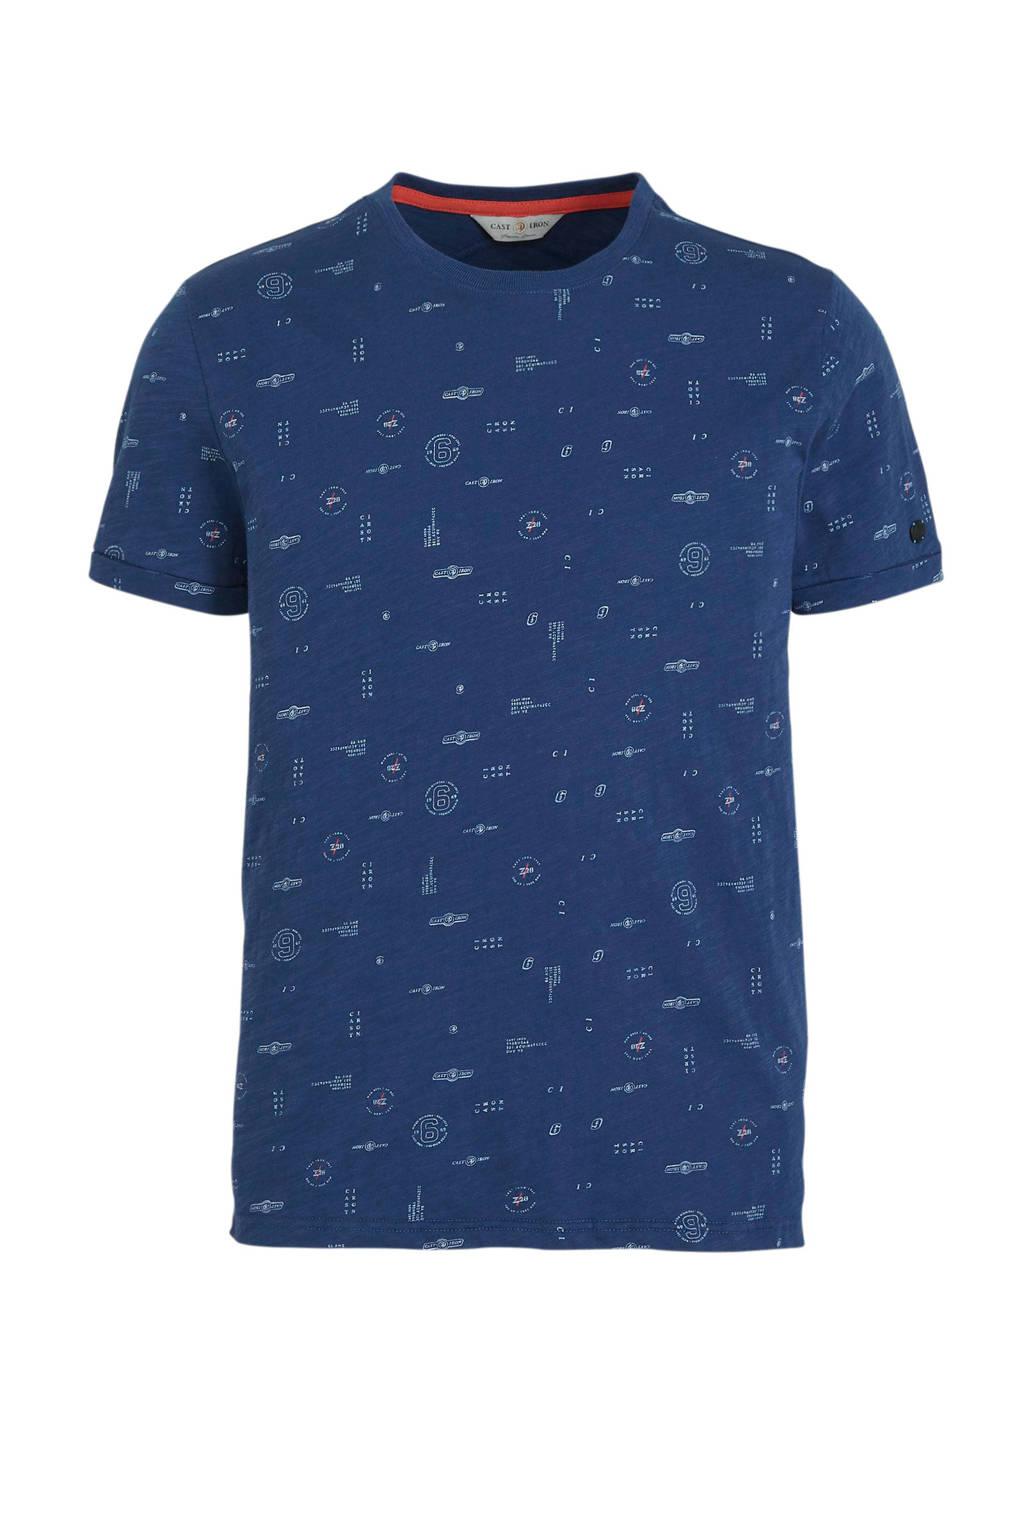 Cast Iron T-shirt met all over print donkerblauw, Donkerblauw